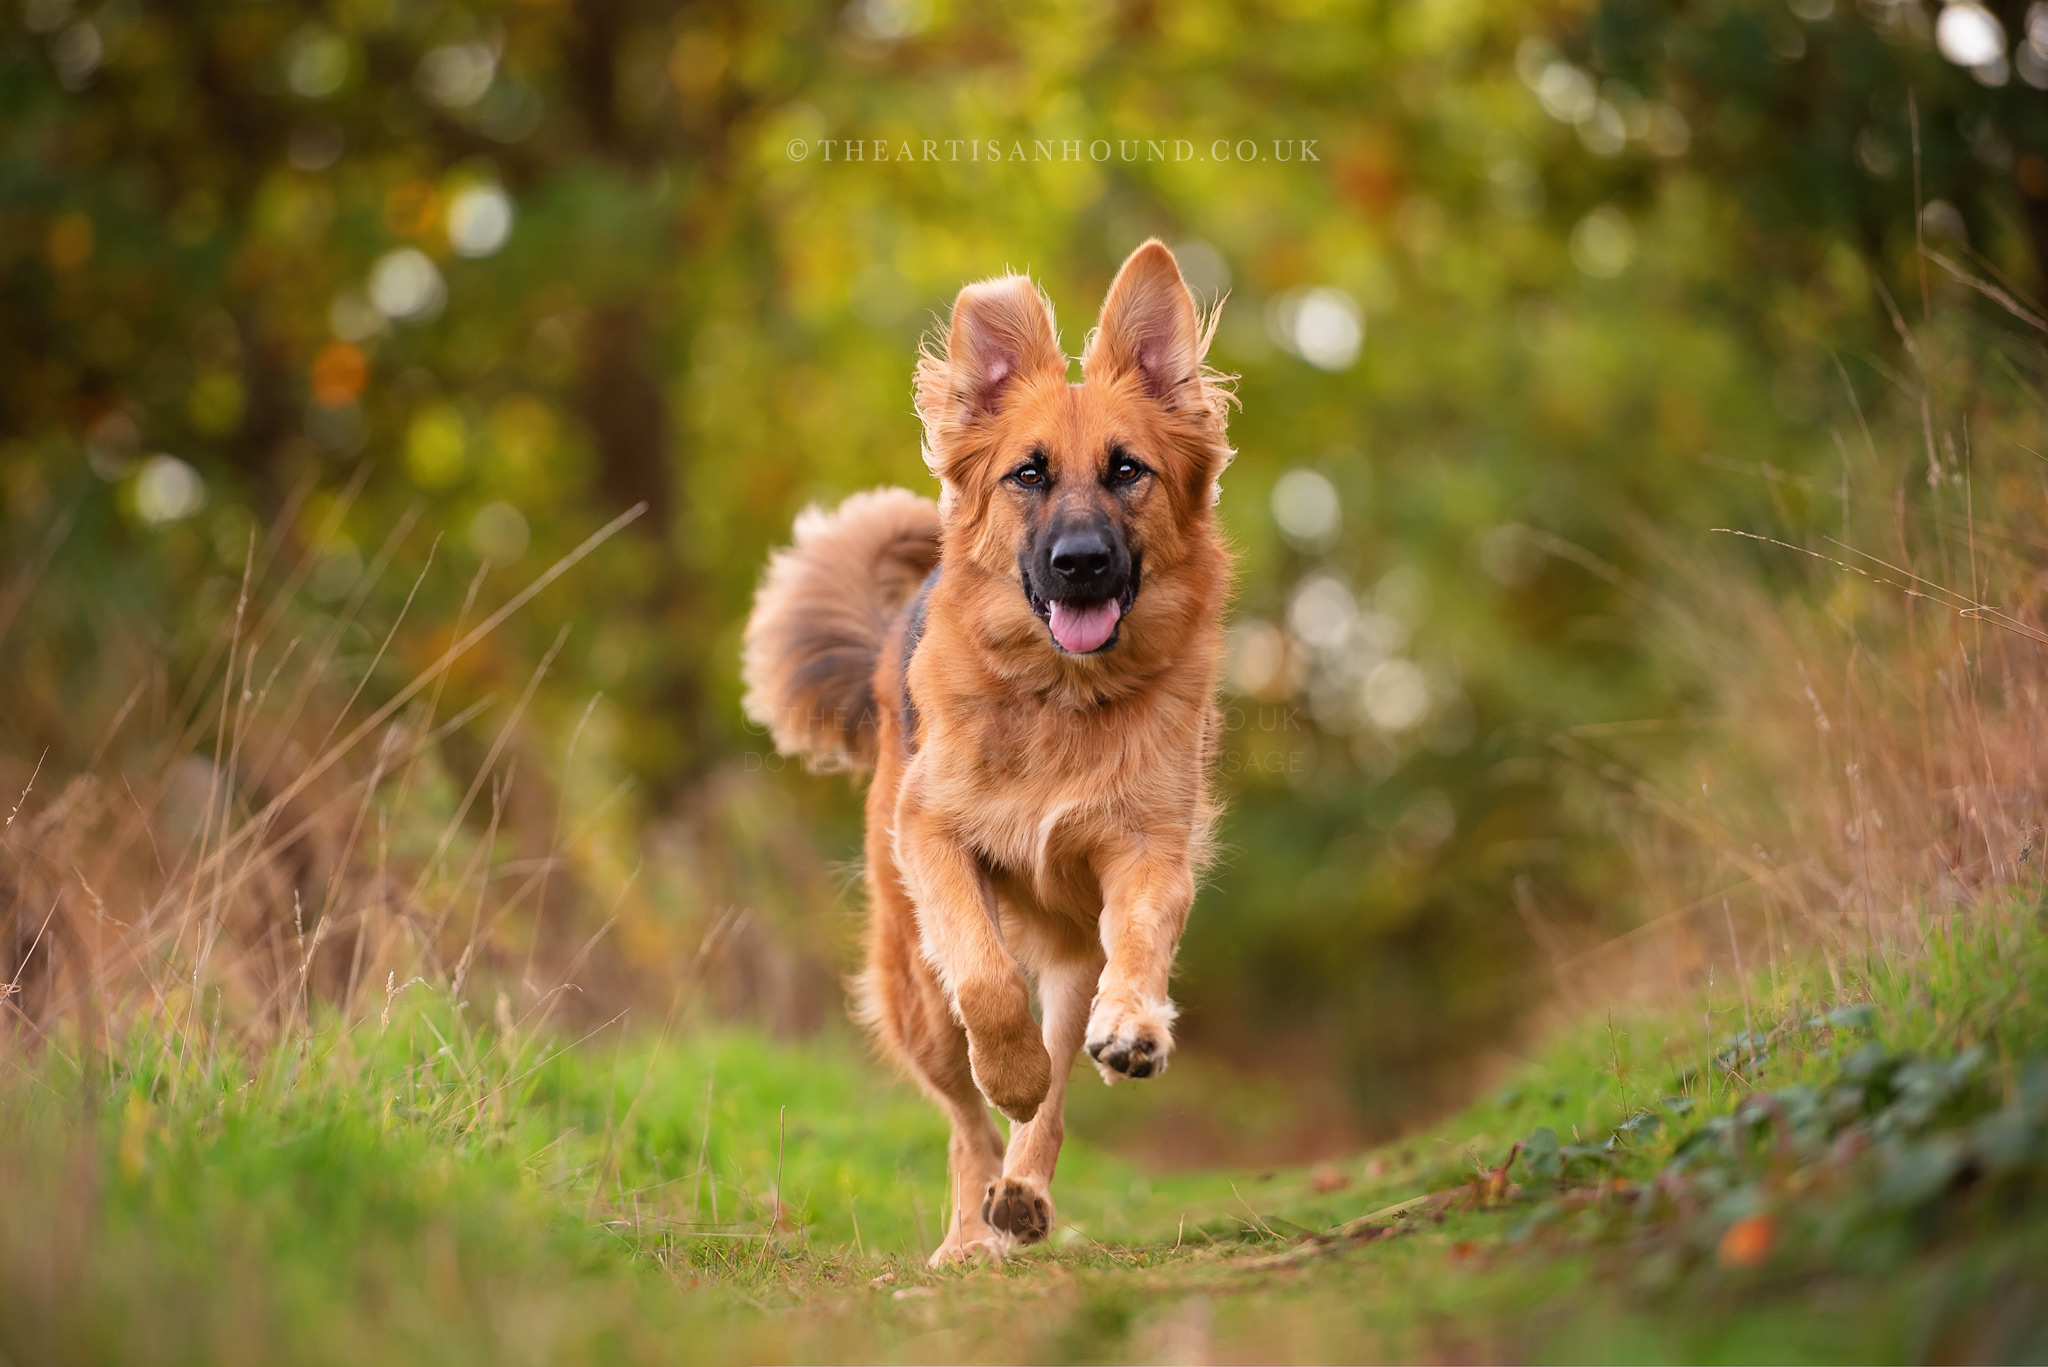 German Shepherd dog running towards photographer across park